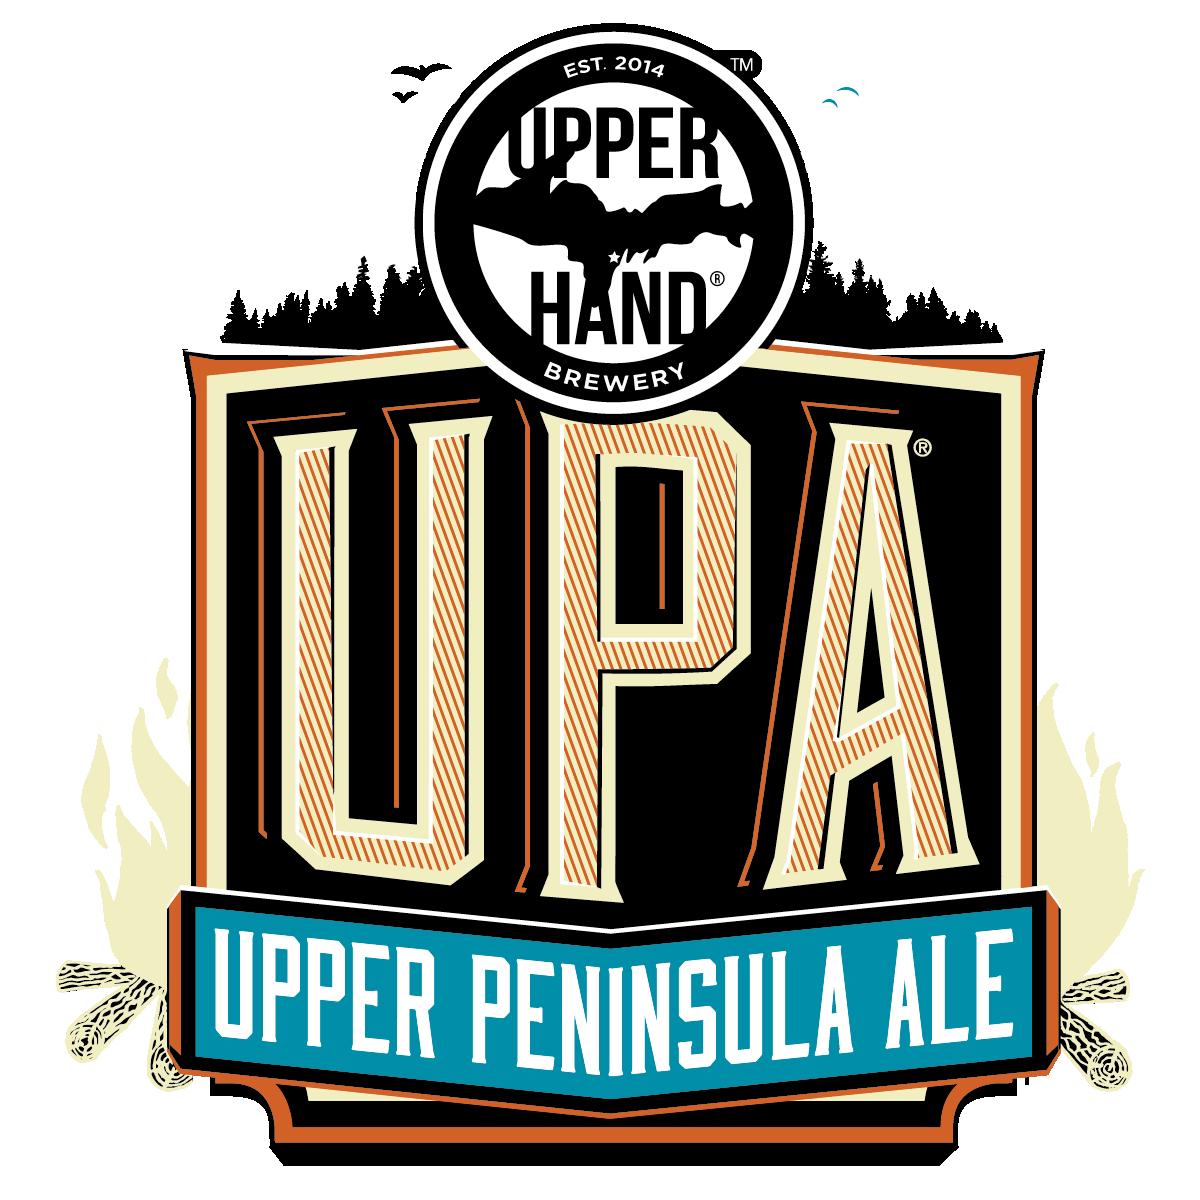 UPA<span class='trade'>®</span>